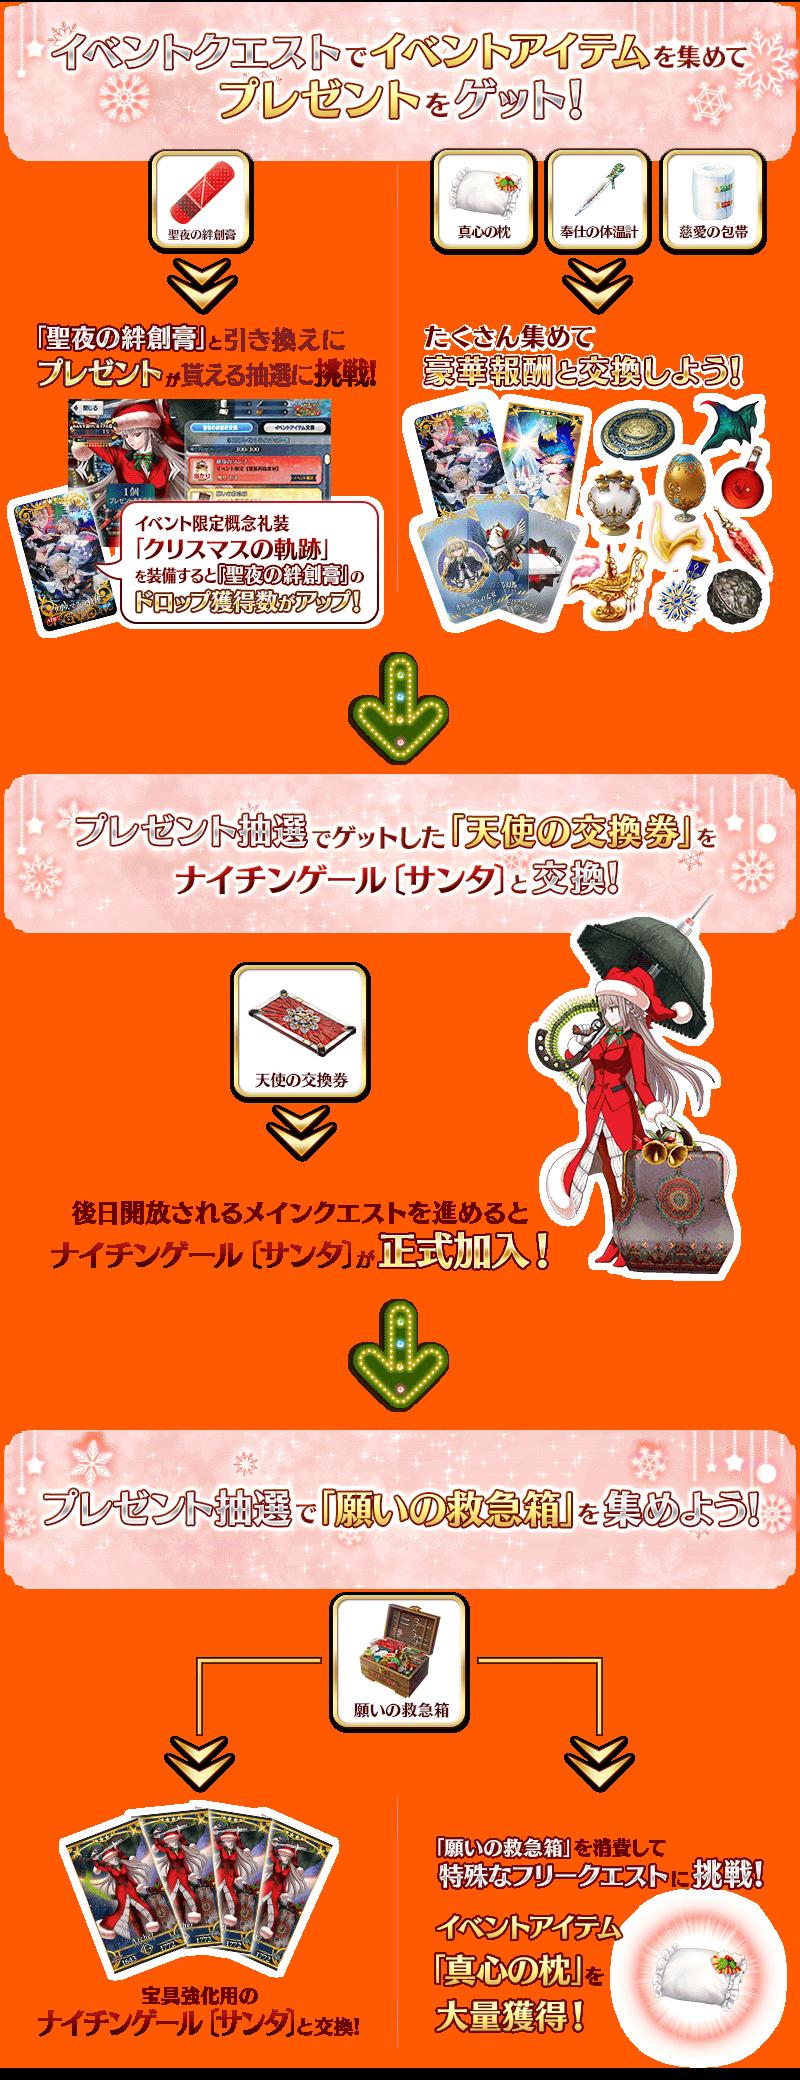 info_image_02